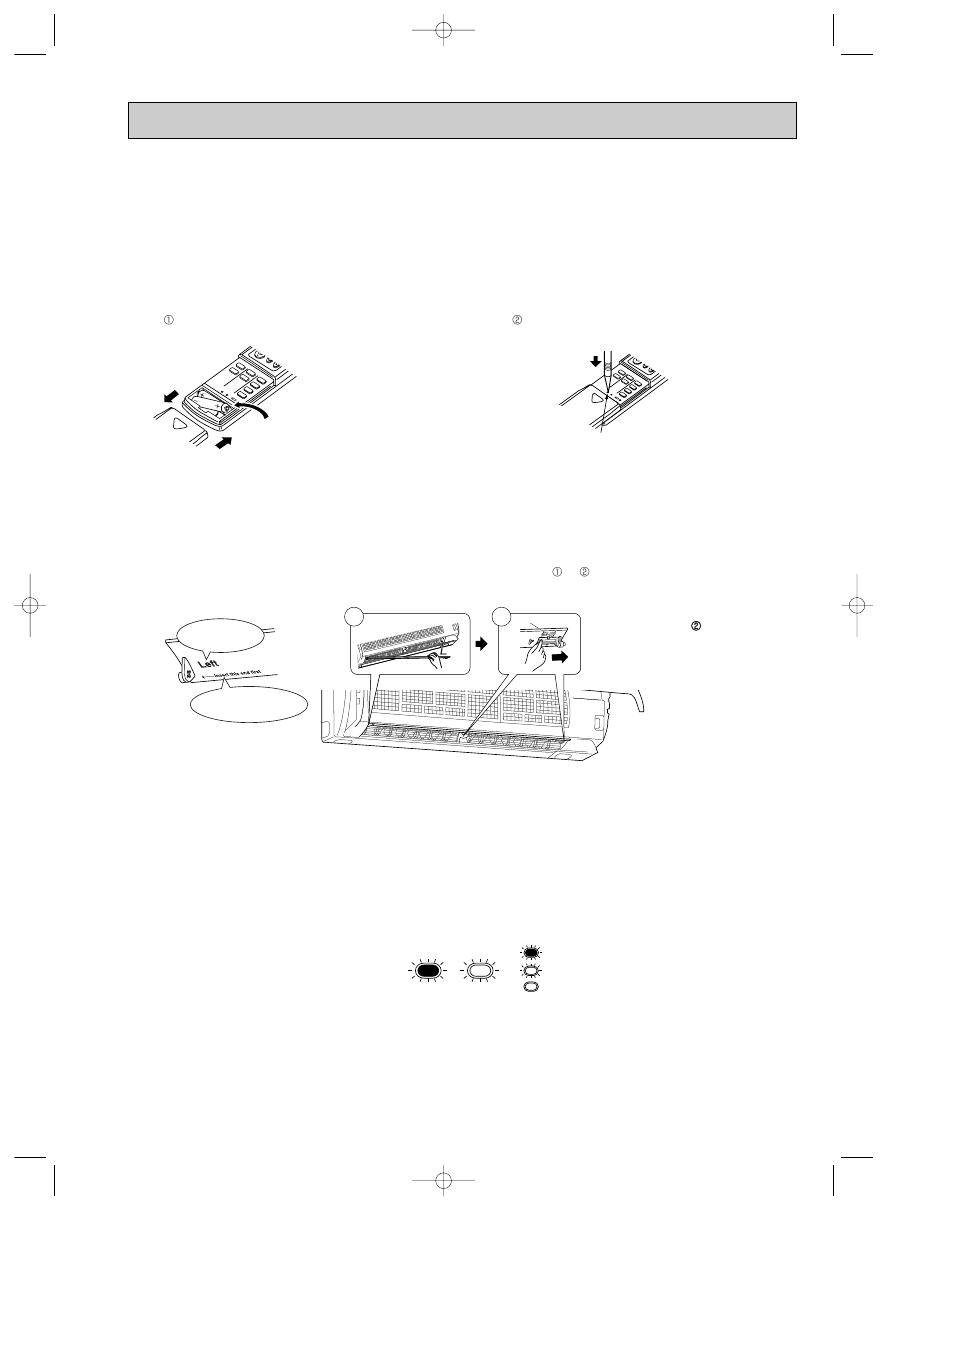 Mitsubishi electric service manual 0b378 | power supply.